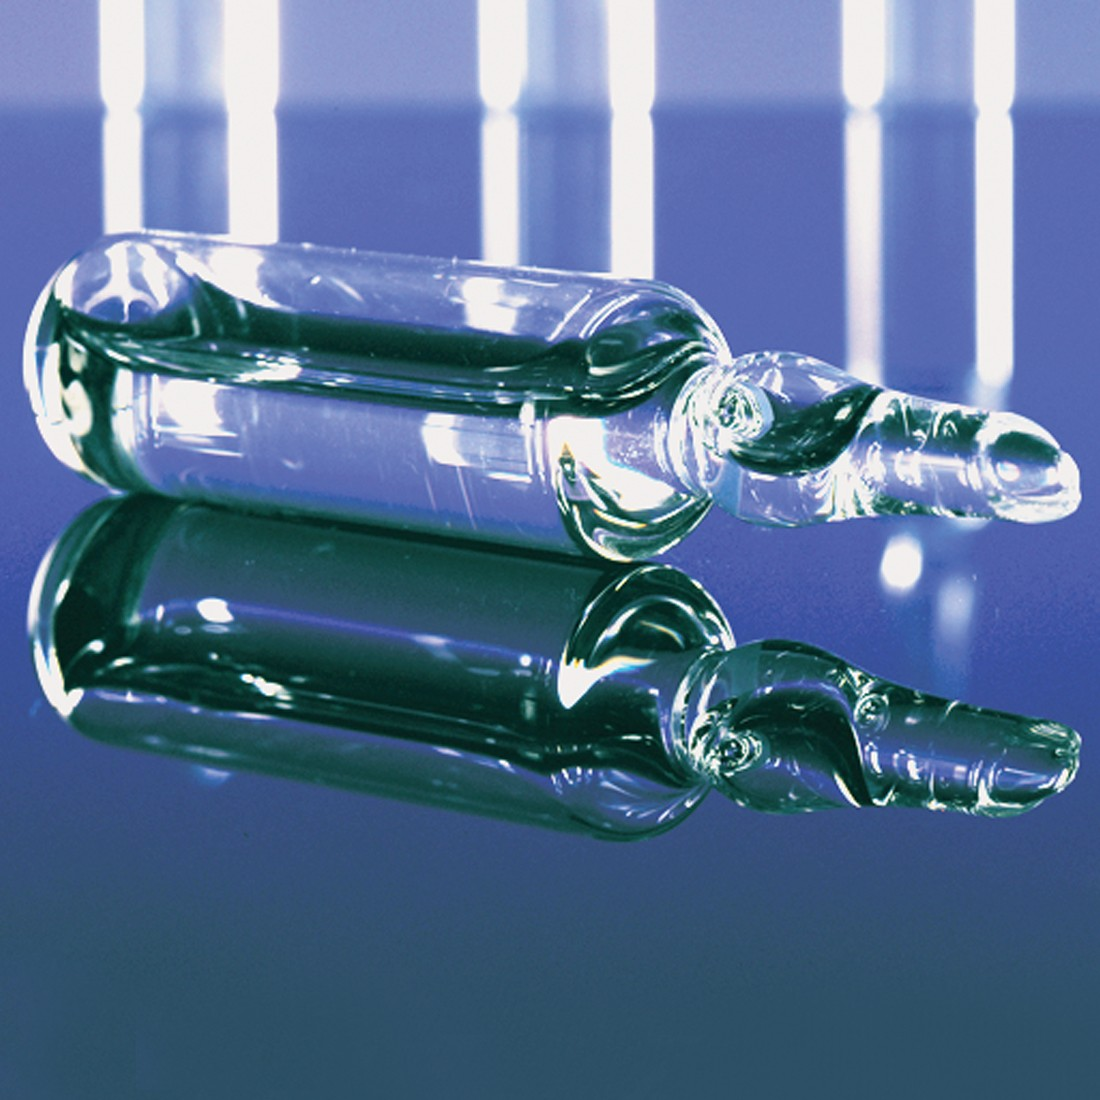 Osmium tetroxide, 2% solution - 10 x 5ml